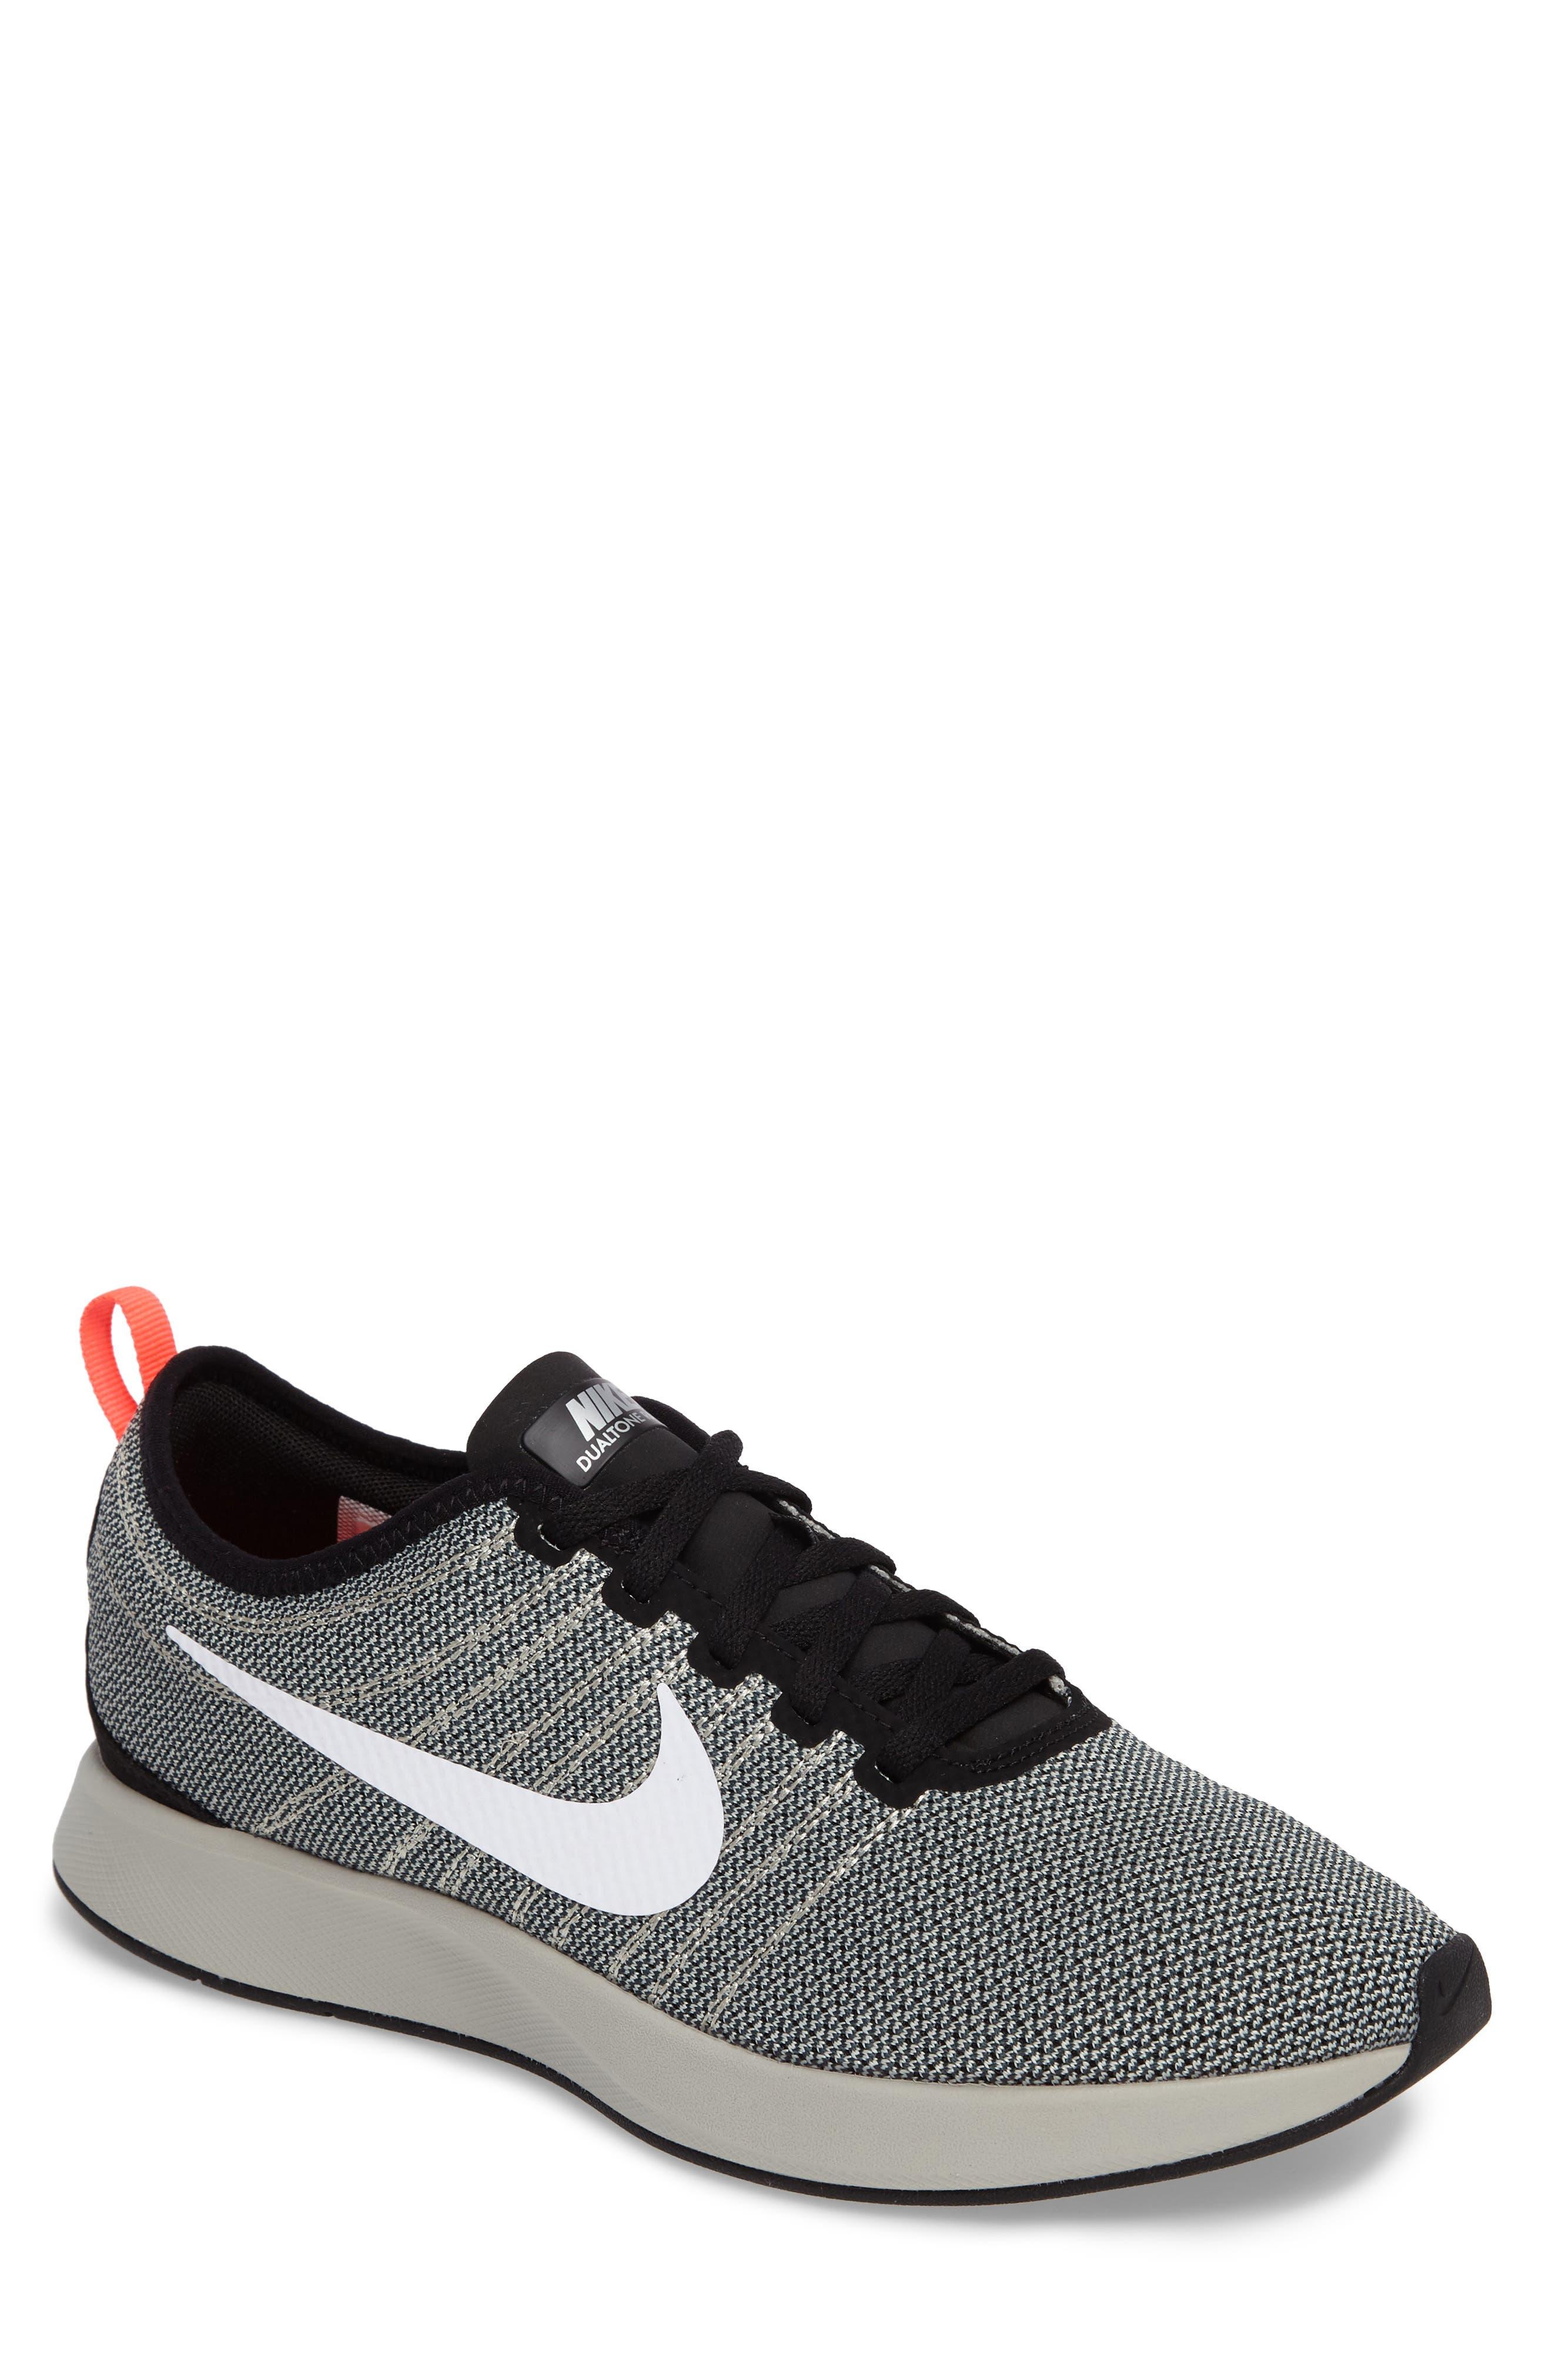 Main Image - Nike Dualtone Racer Running Shoe (Men)